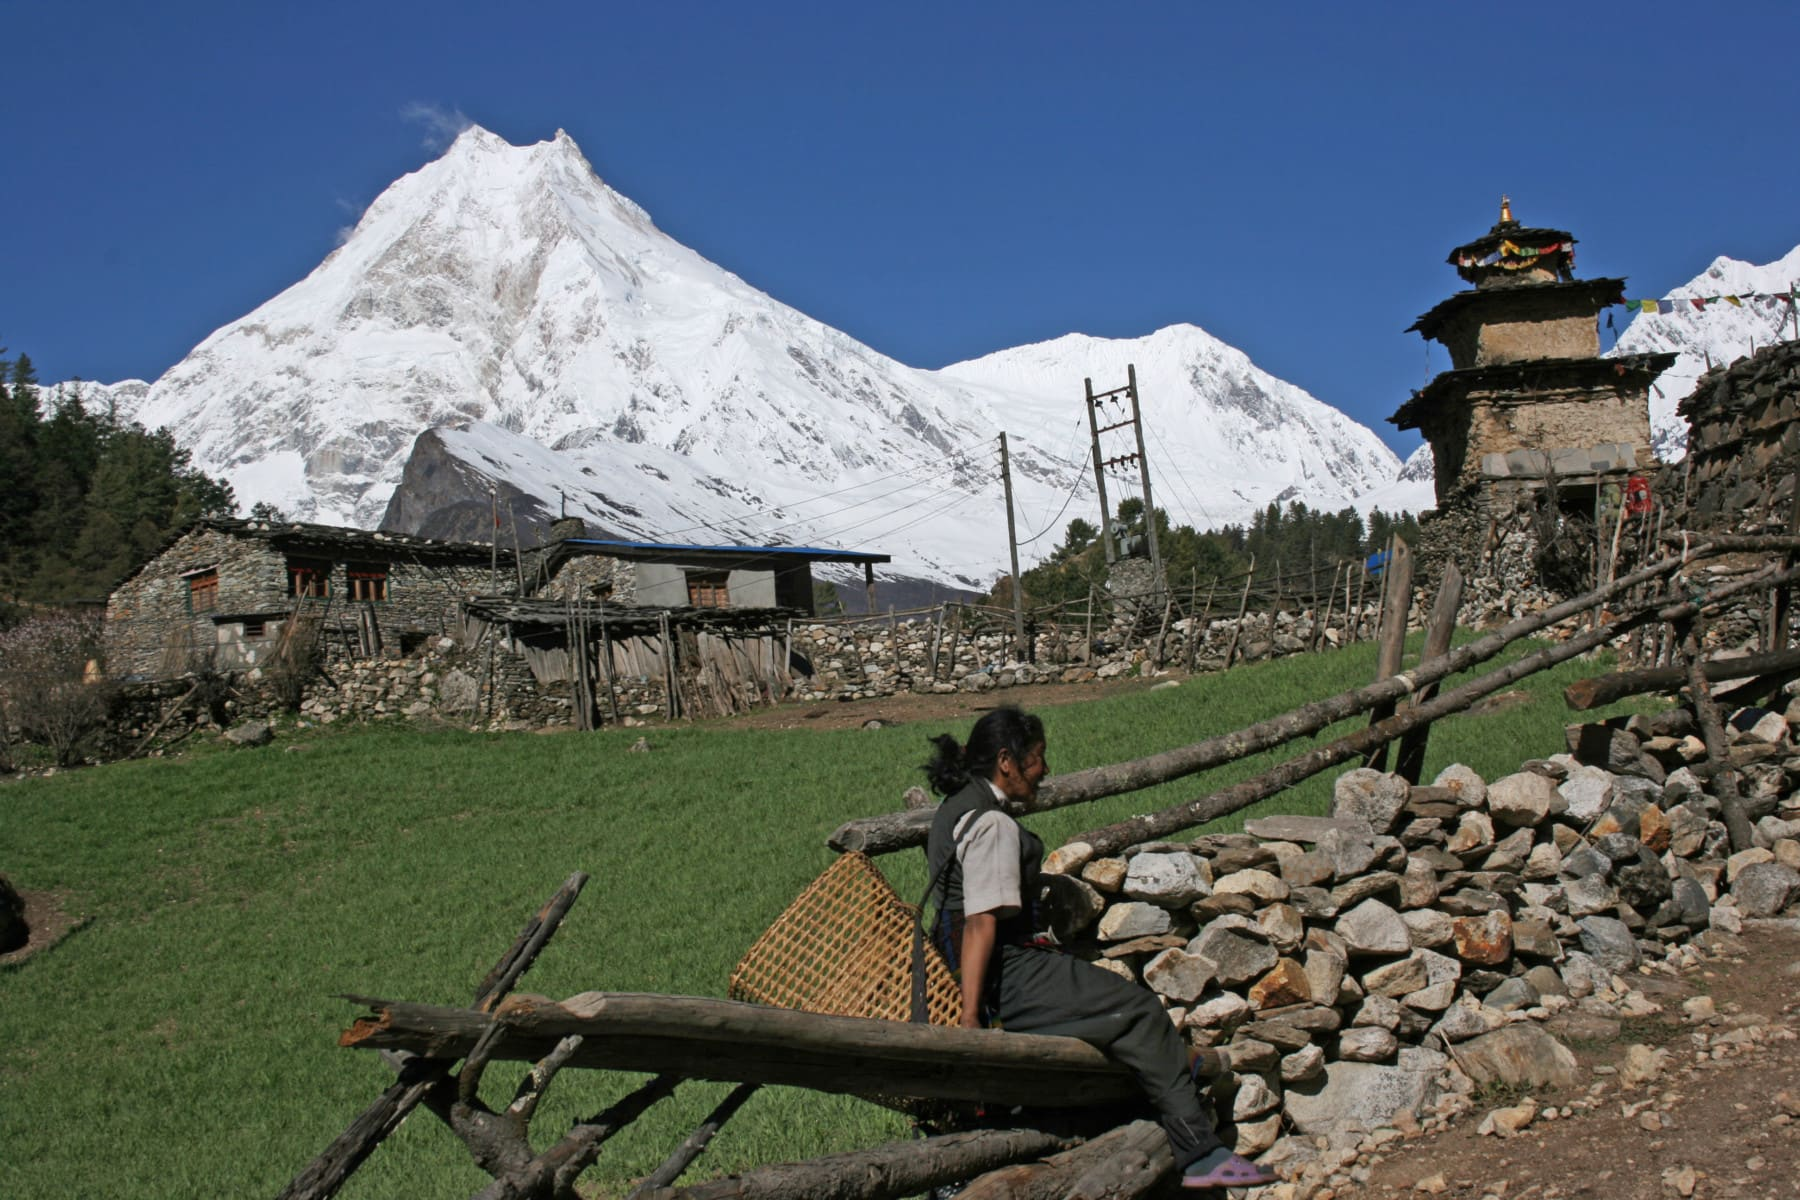 Nepal Trekking on the Manaslu Circuit. Enjoy the International Trip of a lifetime in Nepal.